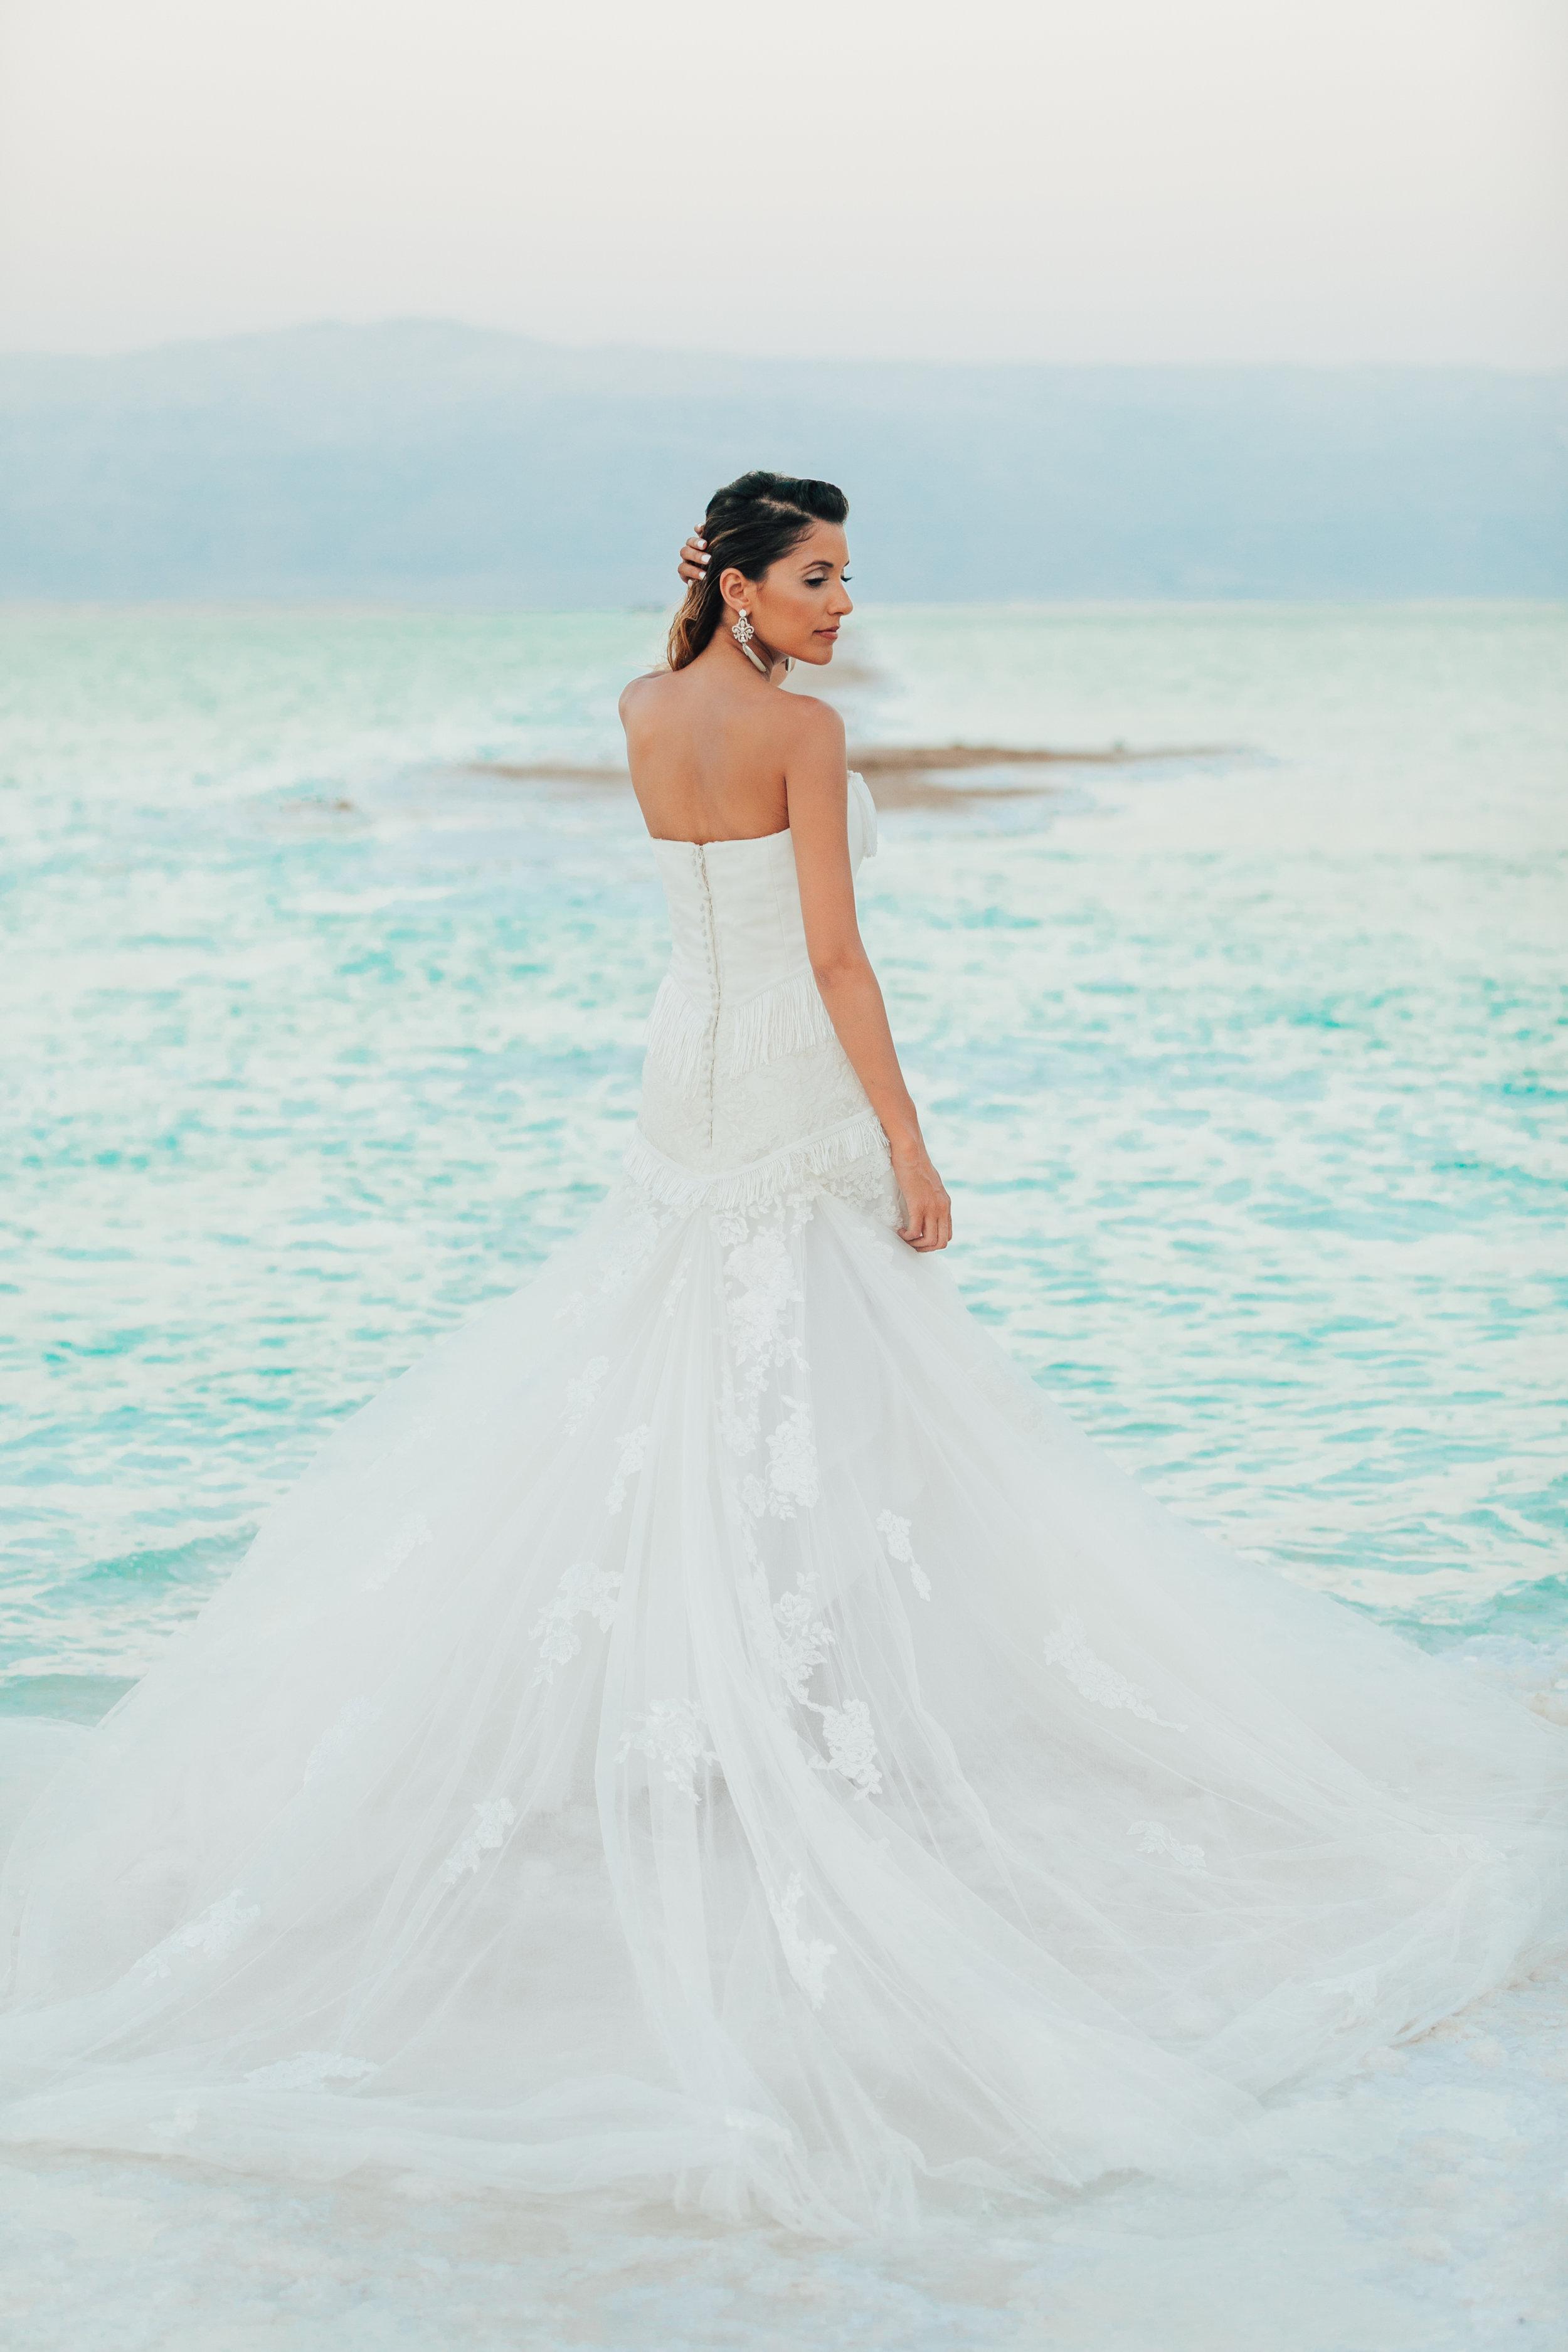 Anée Atelier Israel Nathalie Karynina Bride 16